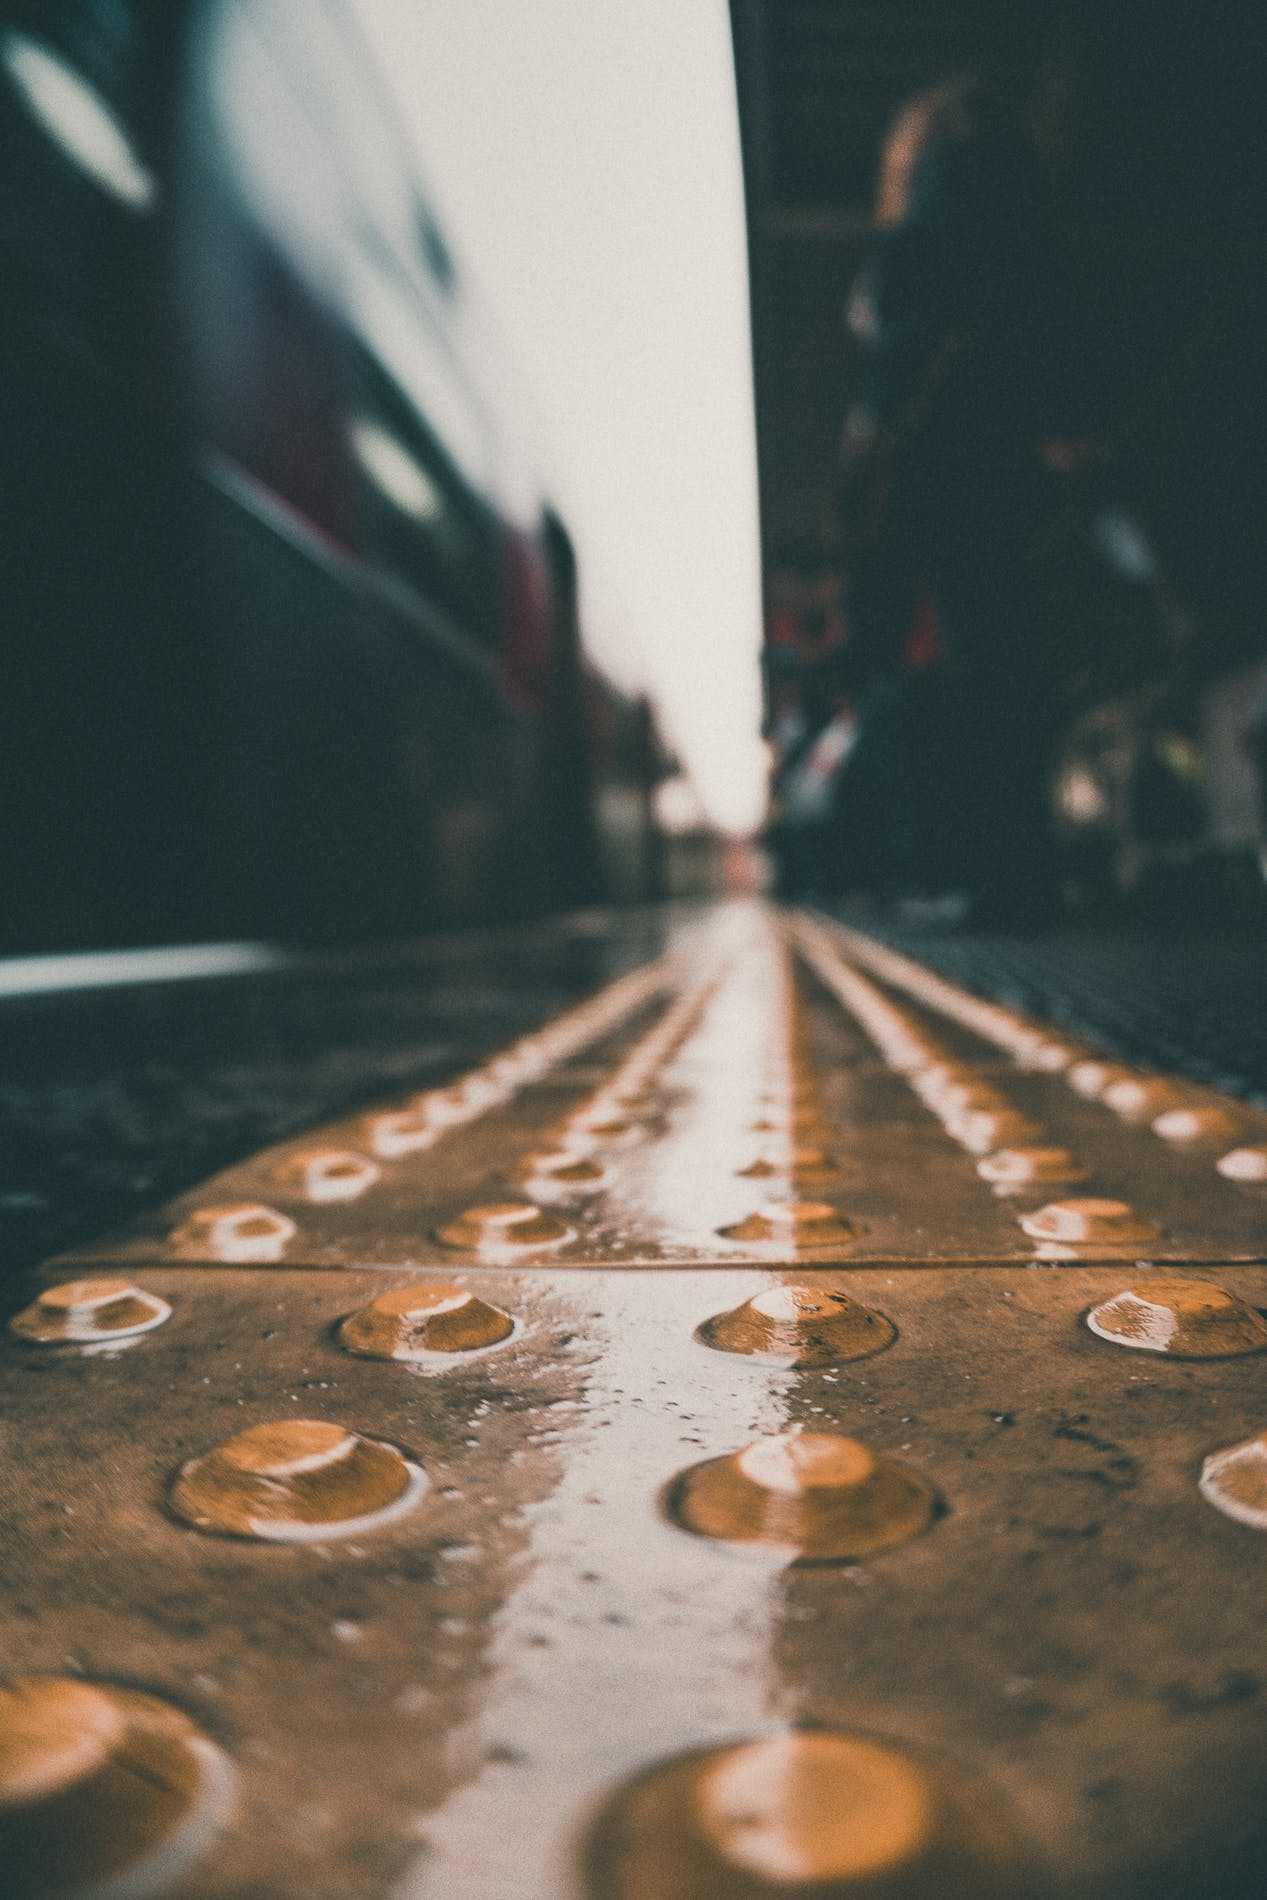 Free stock photo of city, blur, wet, floor